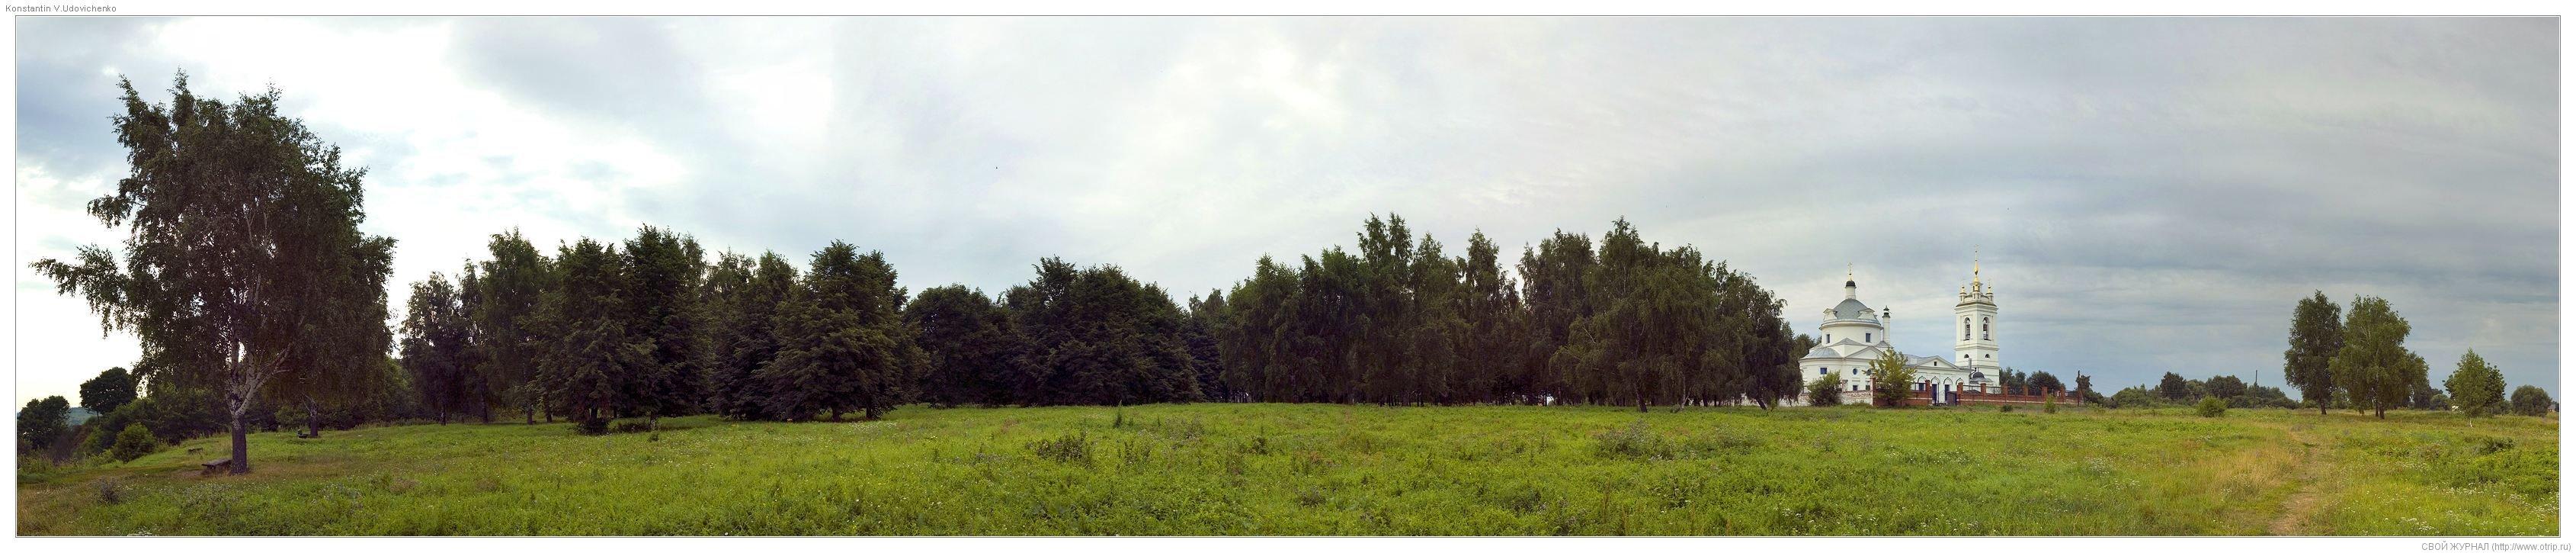 1825-1839-13447x2806s_2.jpg - По Рязанской области (25-29.07.2009)